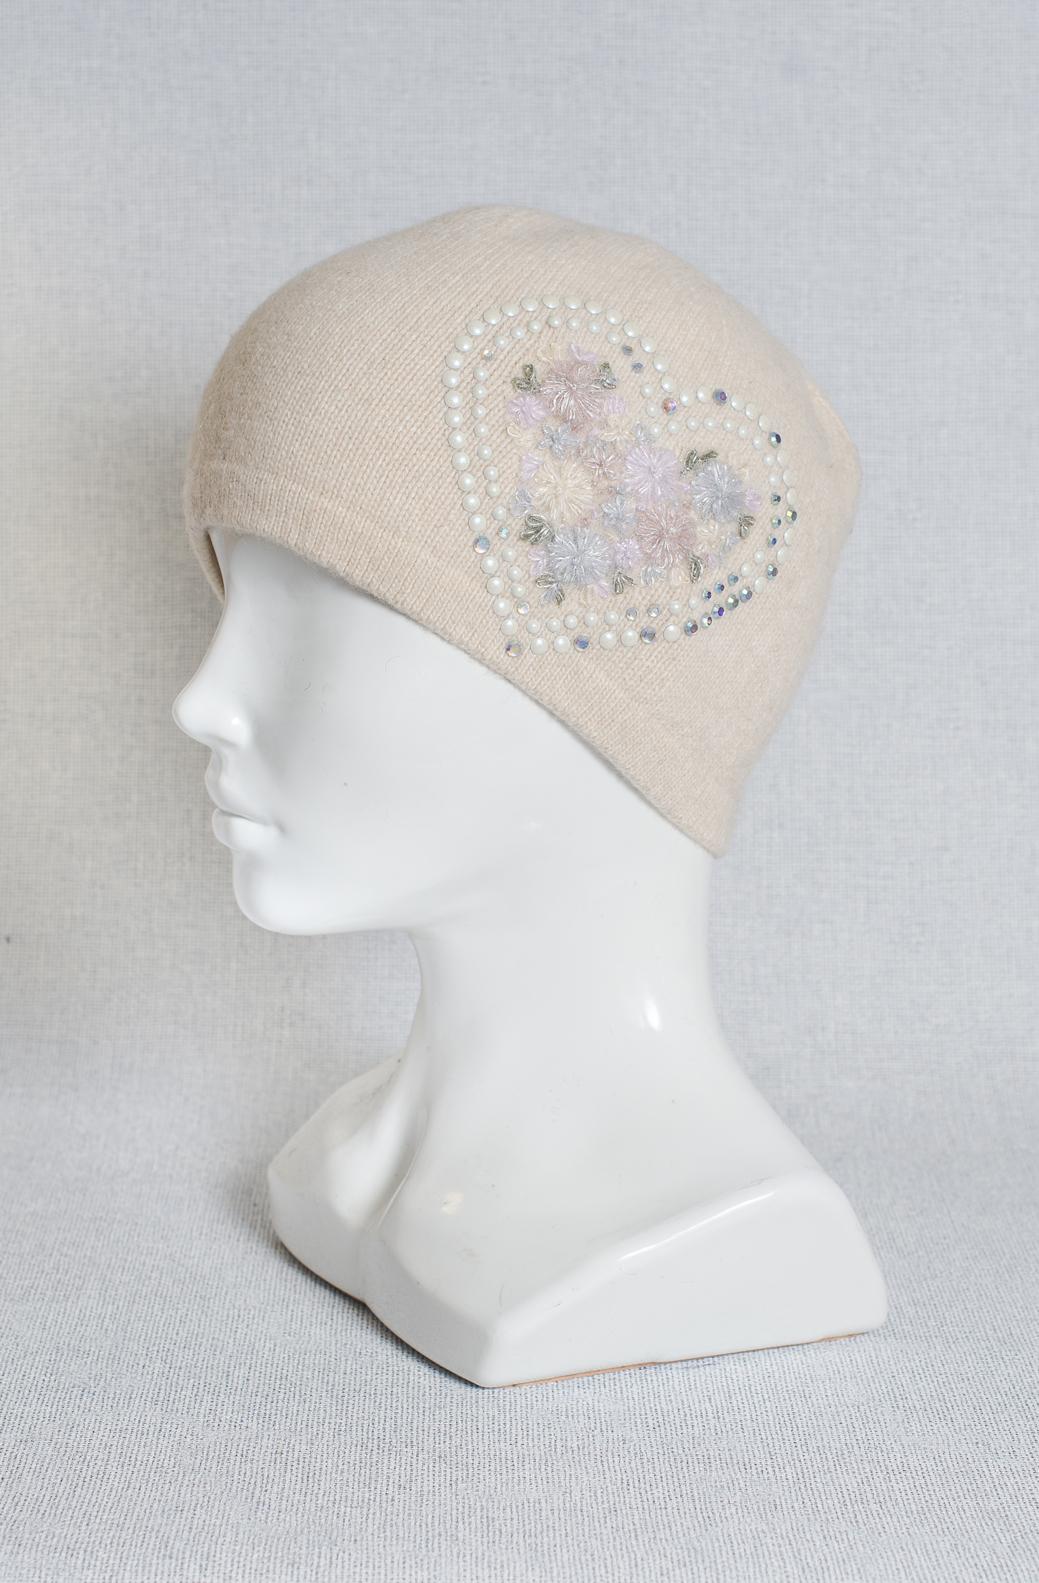 Фото вышивки на шапке стразами